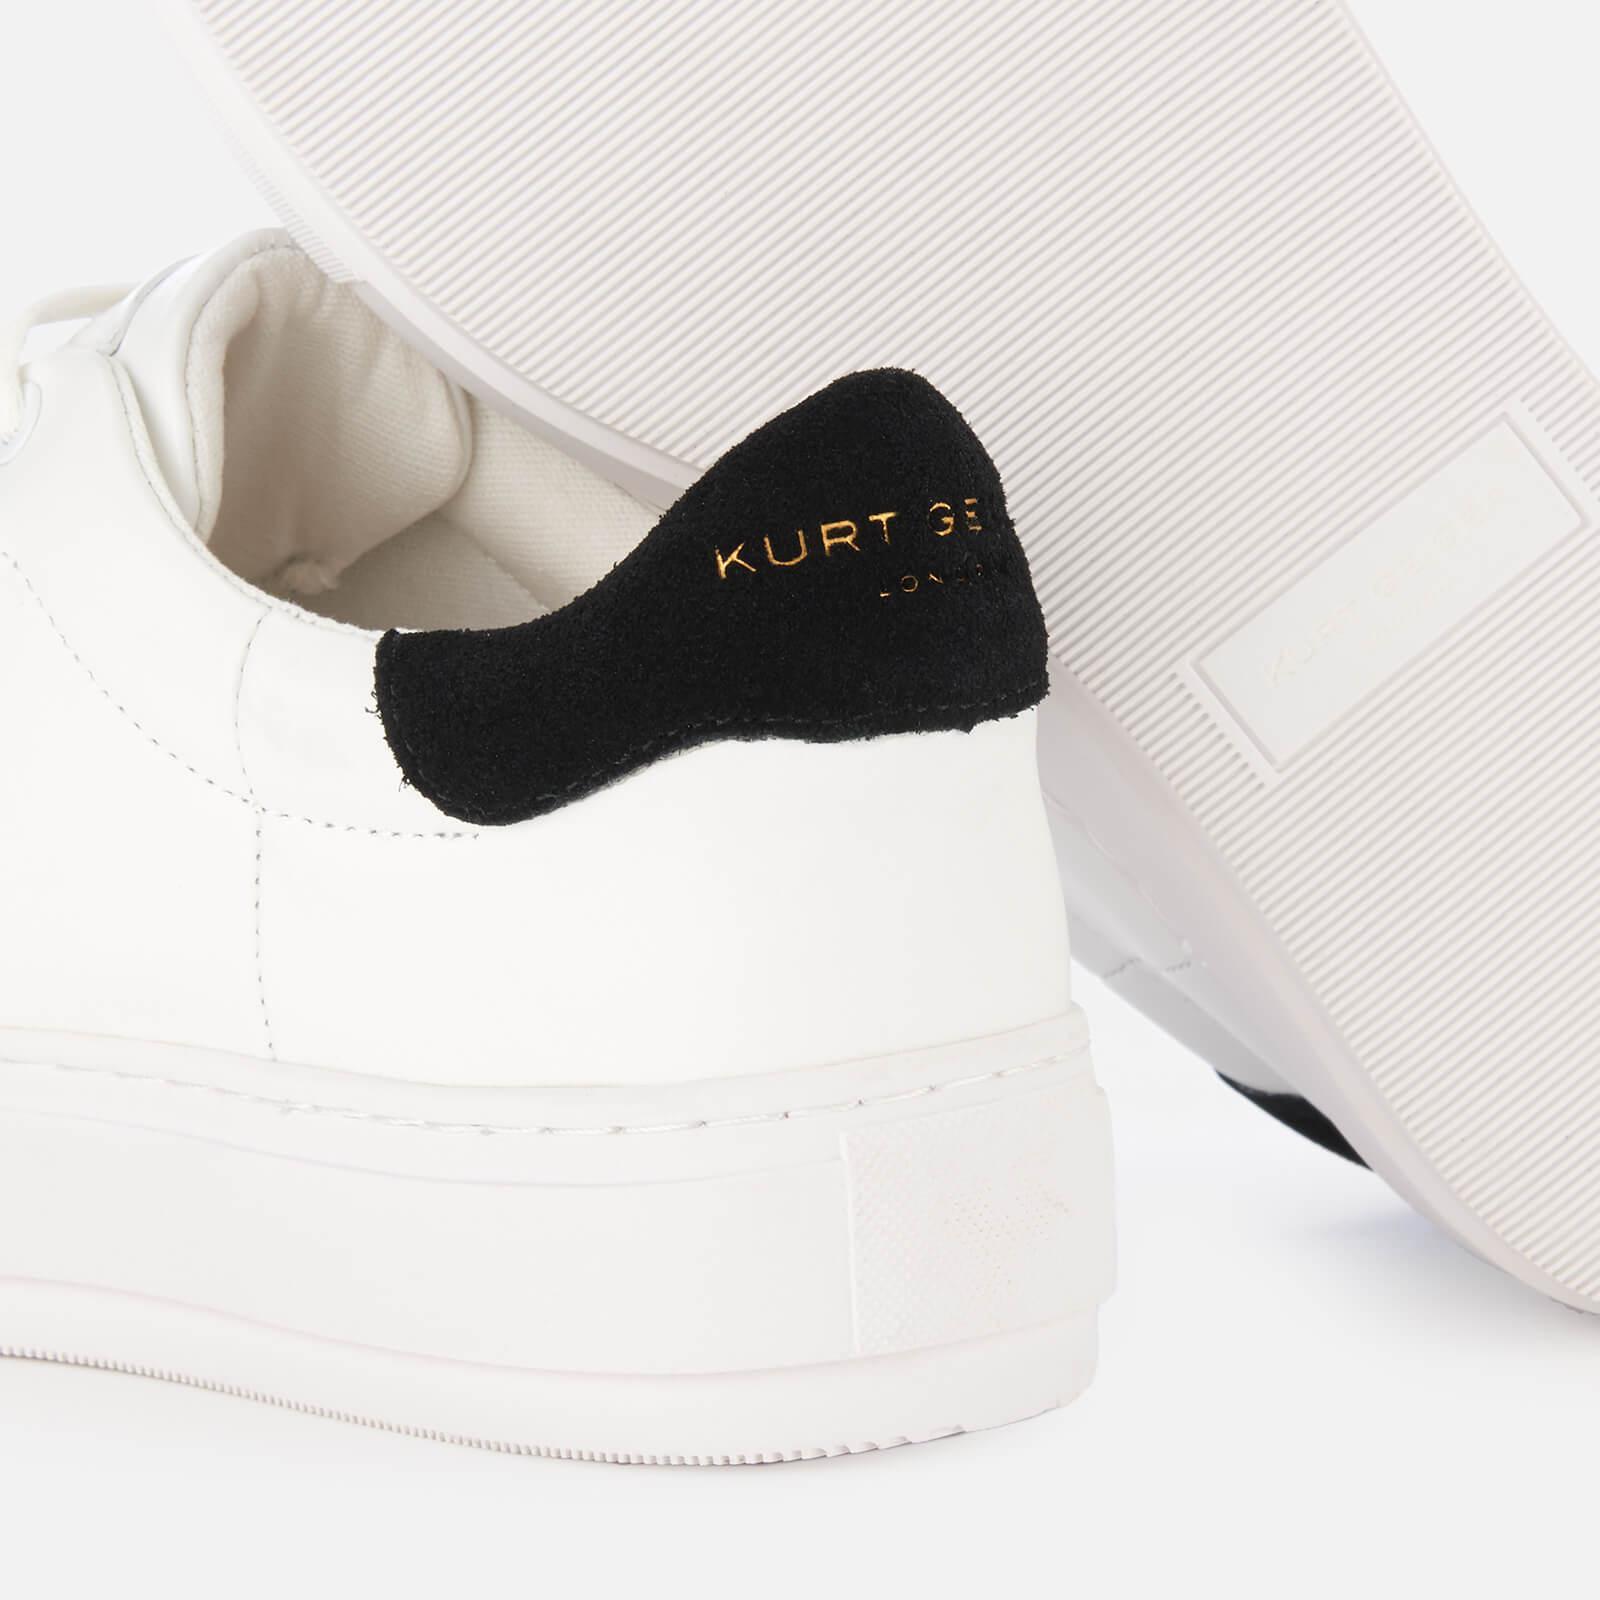 Kurt Geiger Laney Leather Flatform